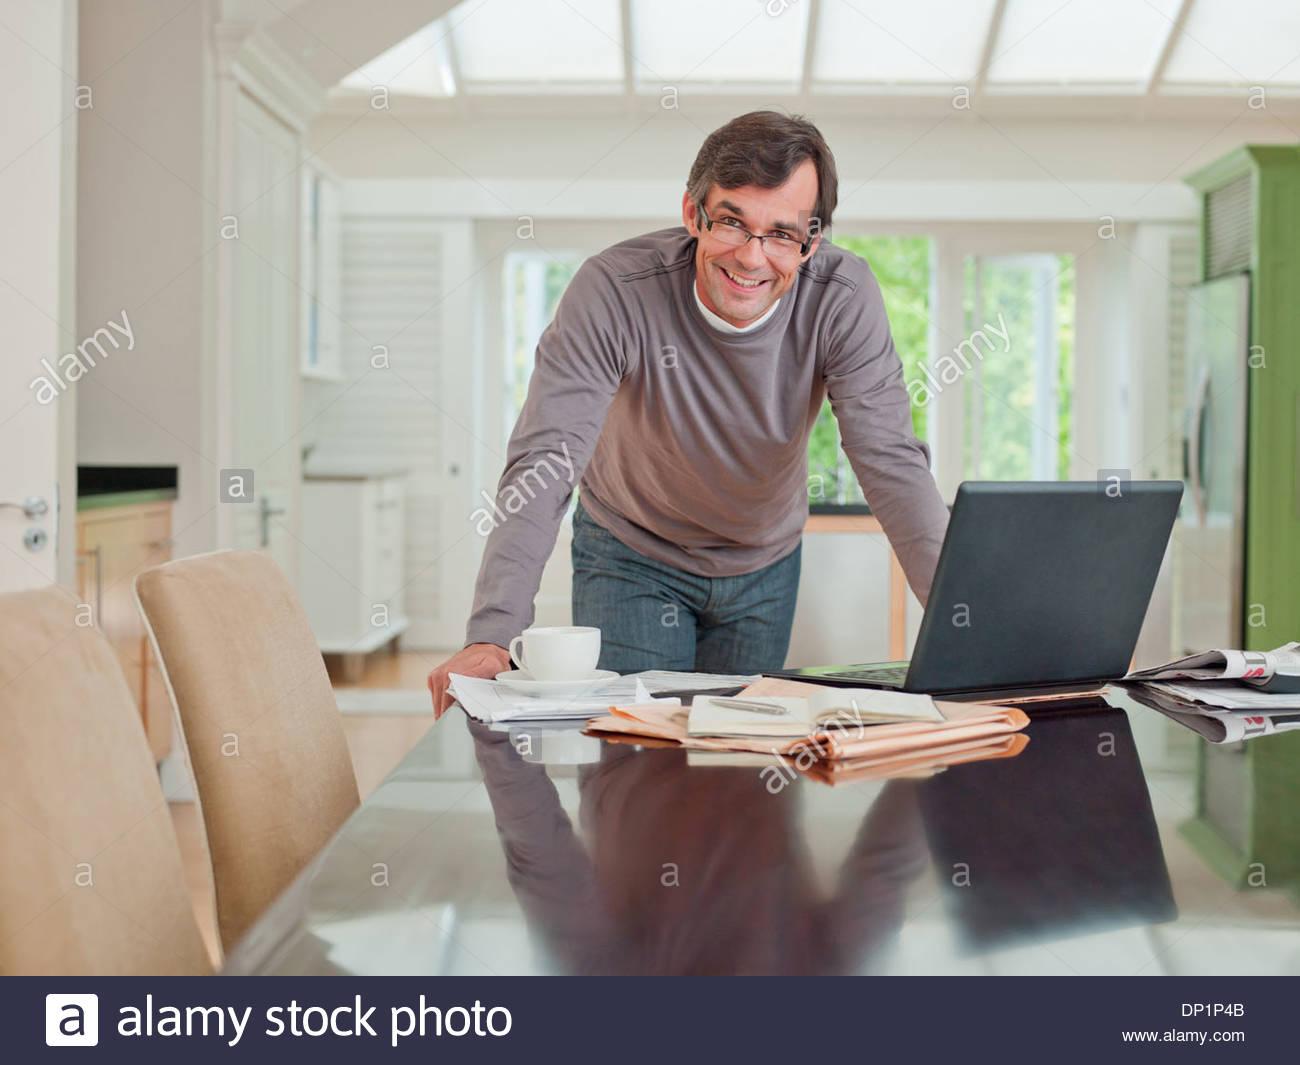 Man looking at laptop Stock Photo